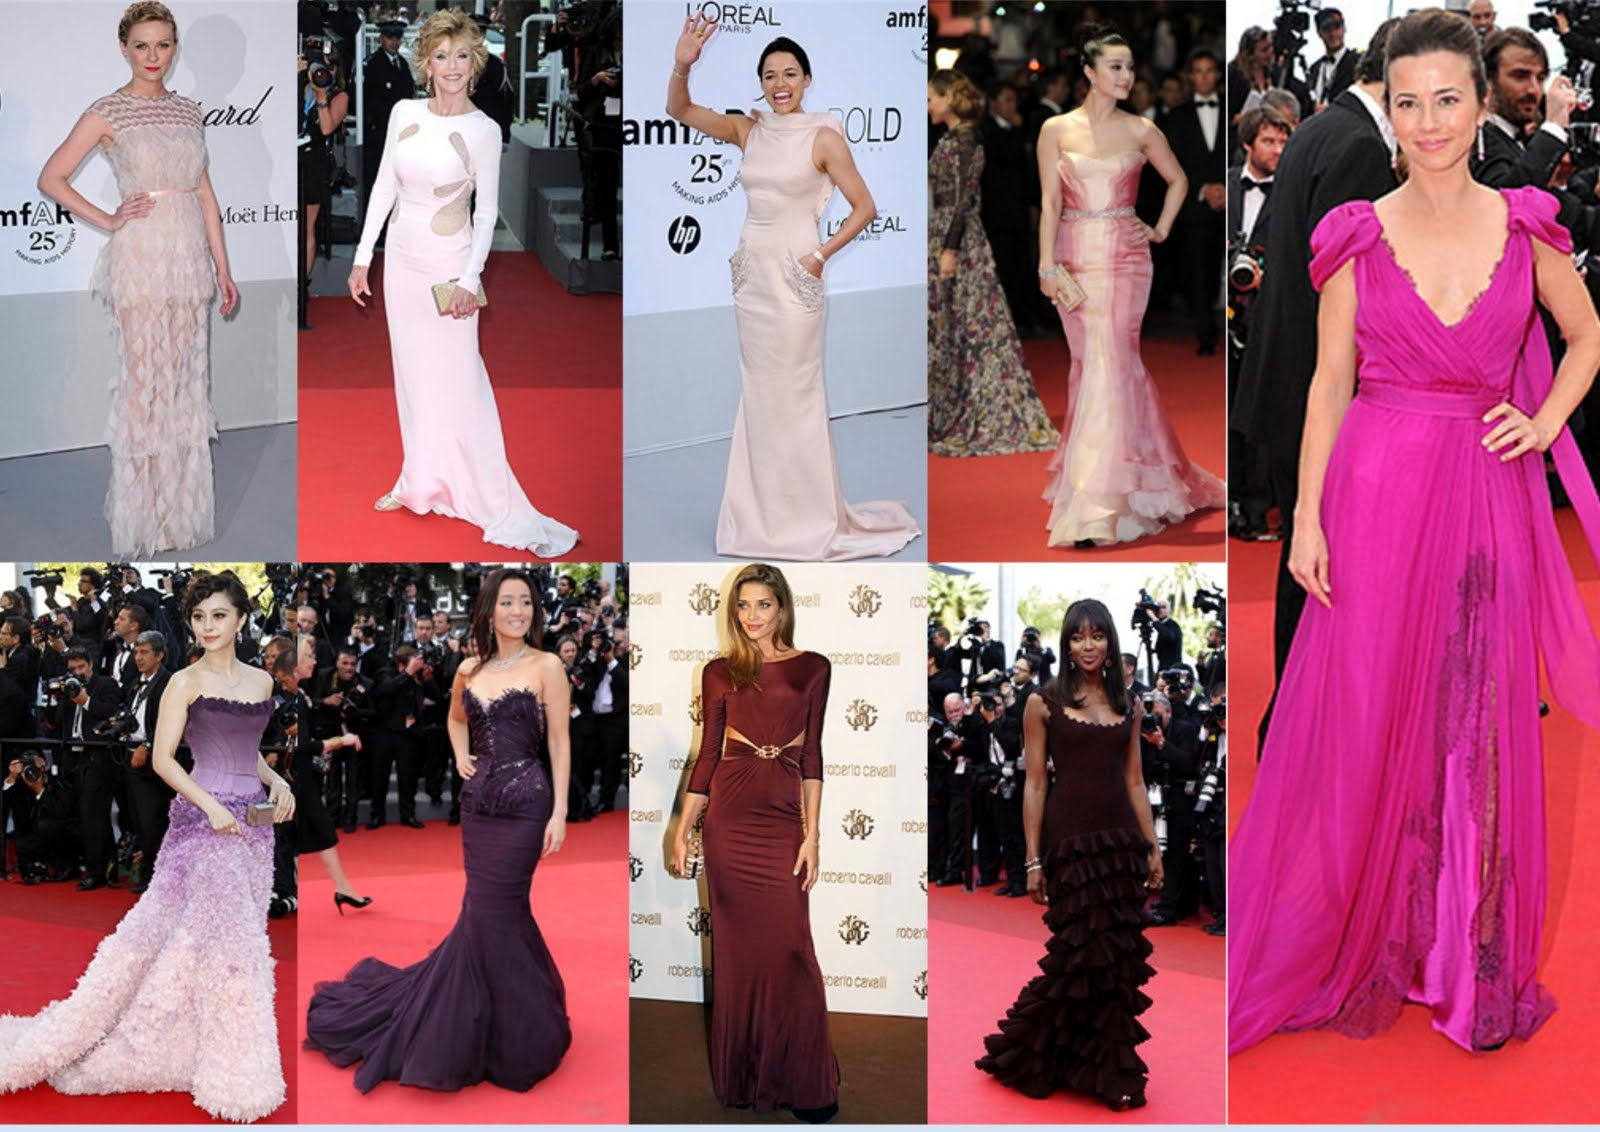 http://1.bp.blogspot.com/-jdcBZ9u-9gM/Td7lFyDwBaI/AAAAAAAAAGM/QkX2DfgxJ10/s1600/Vestidos+Rosas+Cannes+2011.jpg